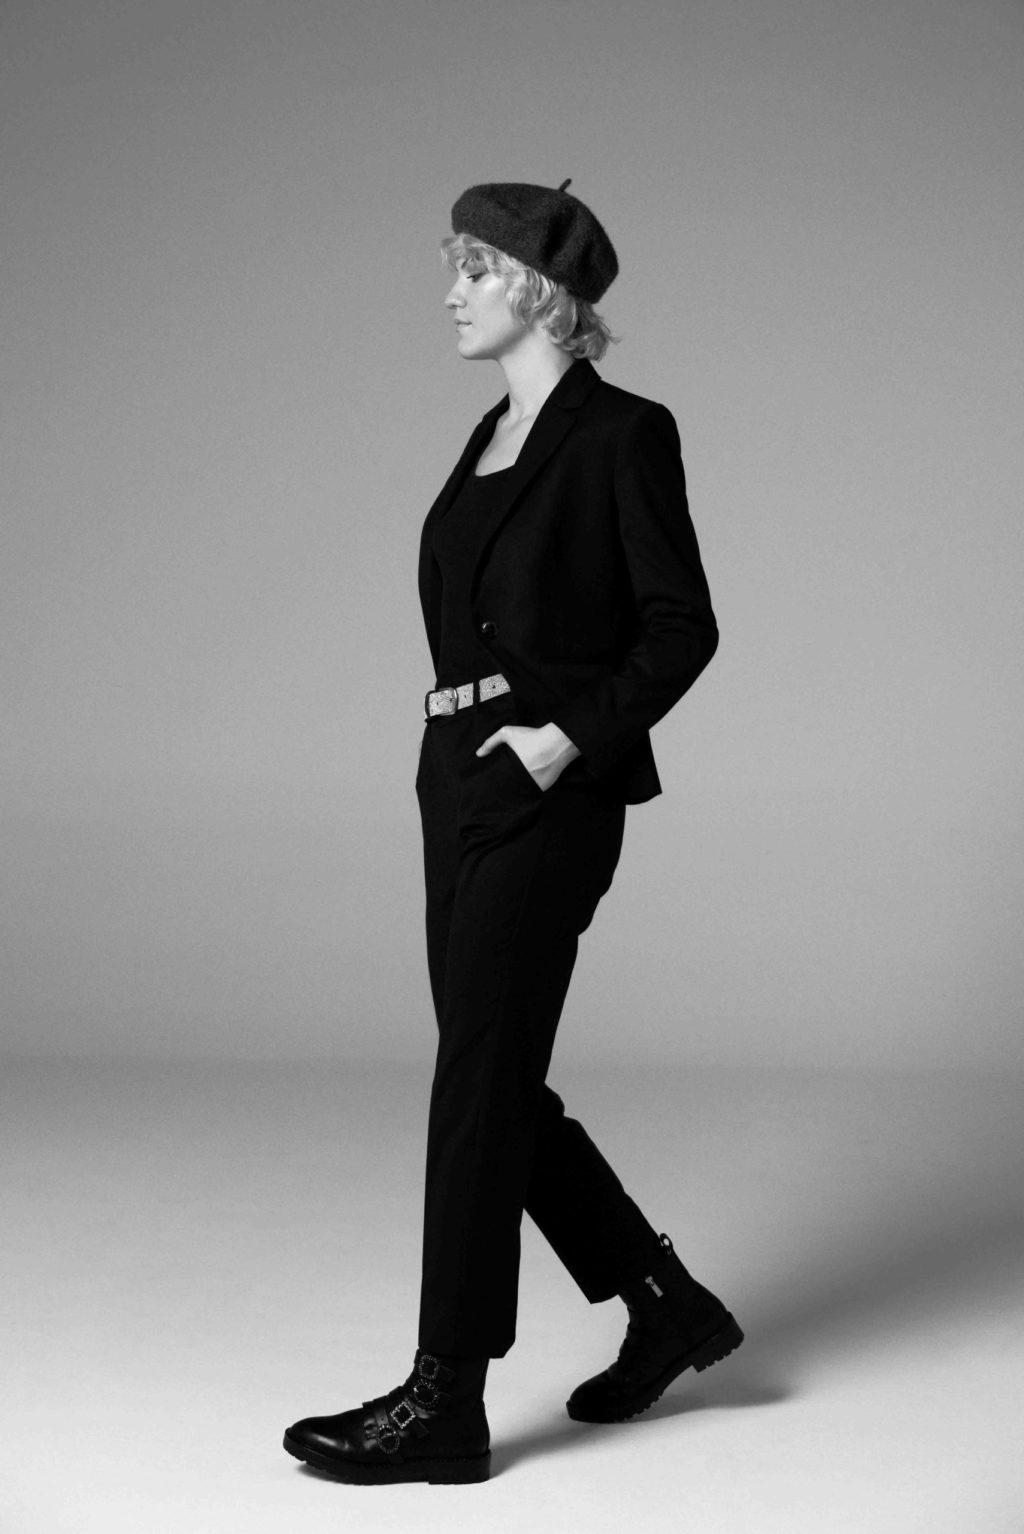 botas traje suit negro tomboy style fashion test